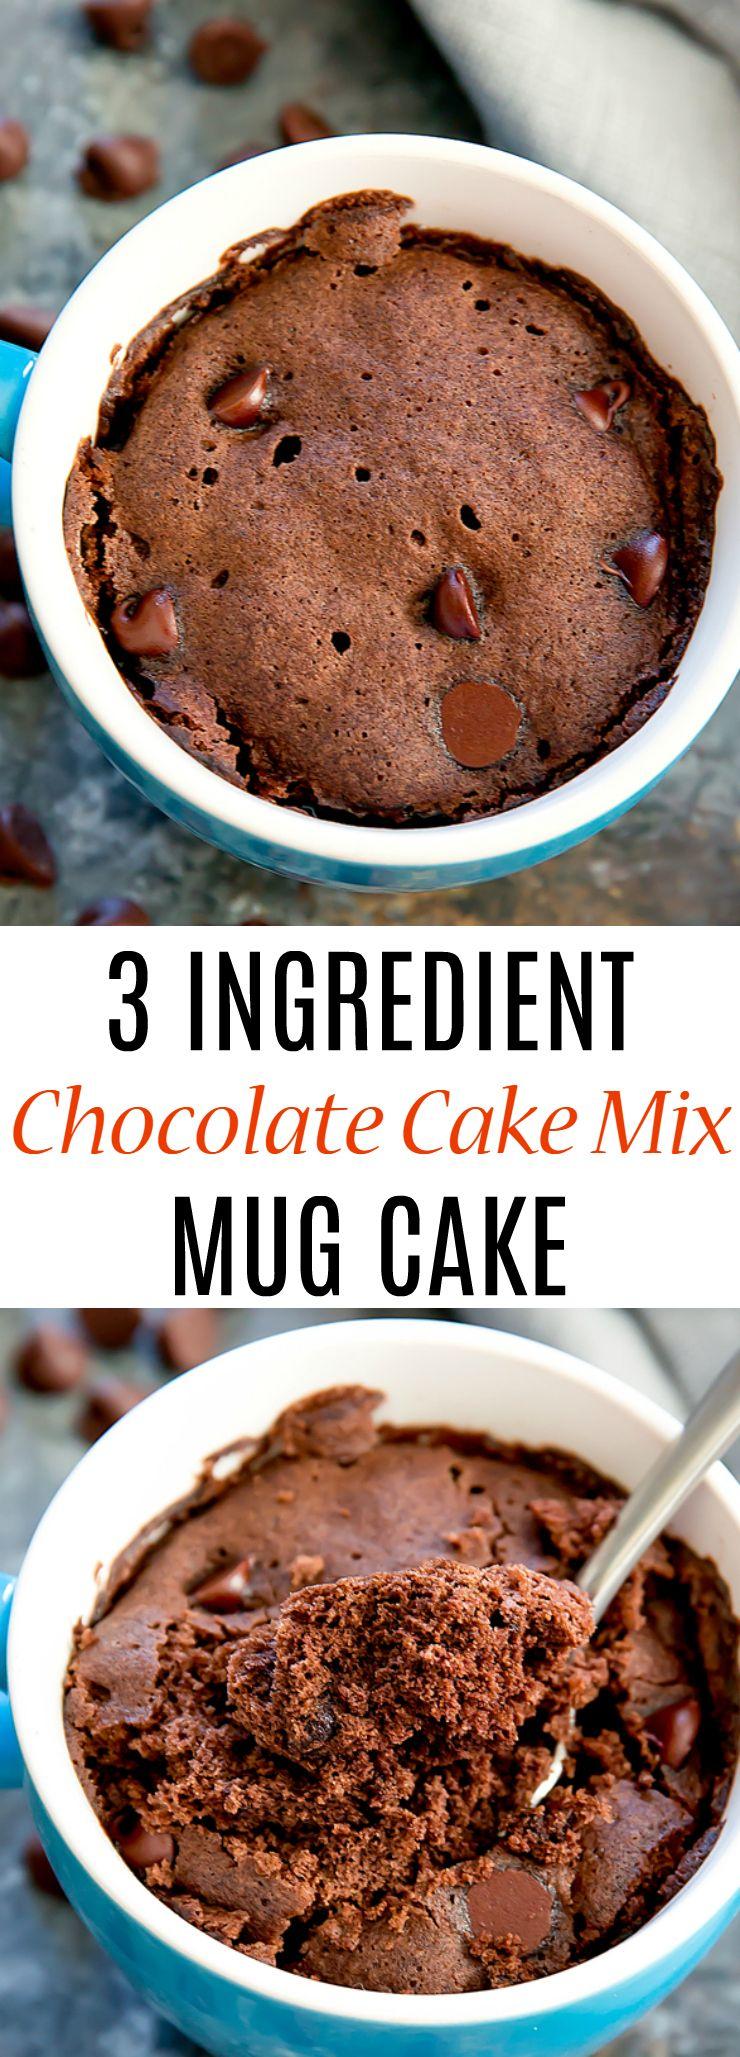 3 Ingredient Chocolate Cake Mix Mug Cake   Recipe (With ...